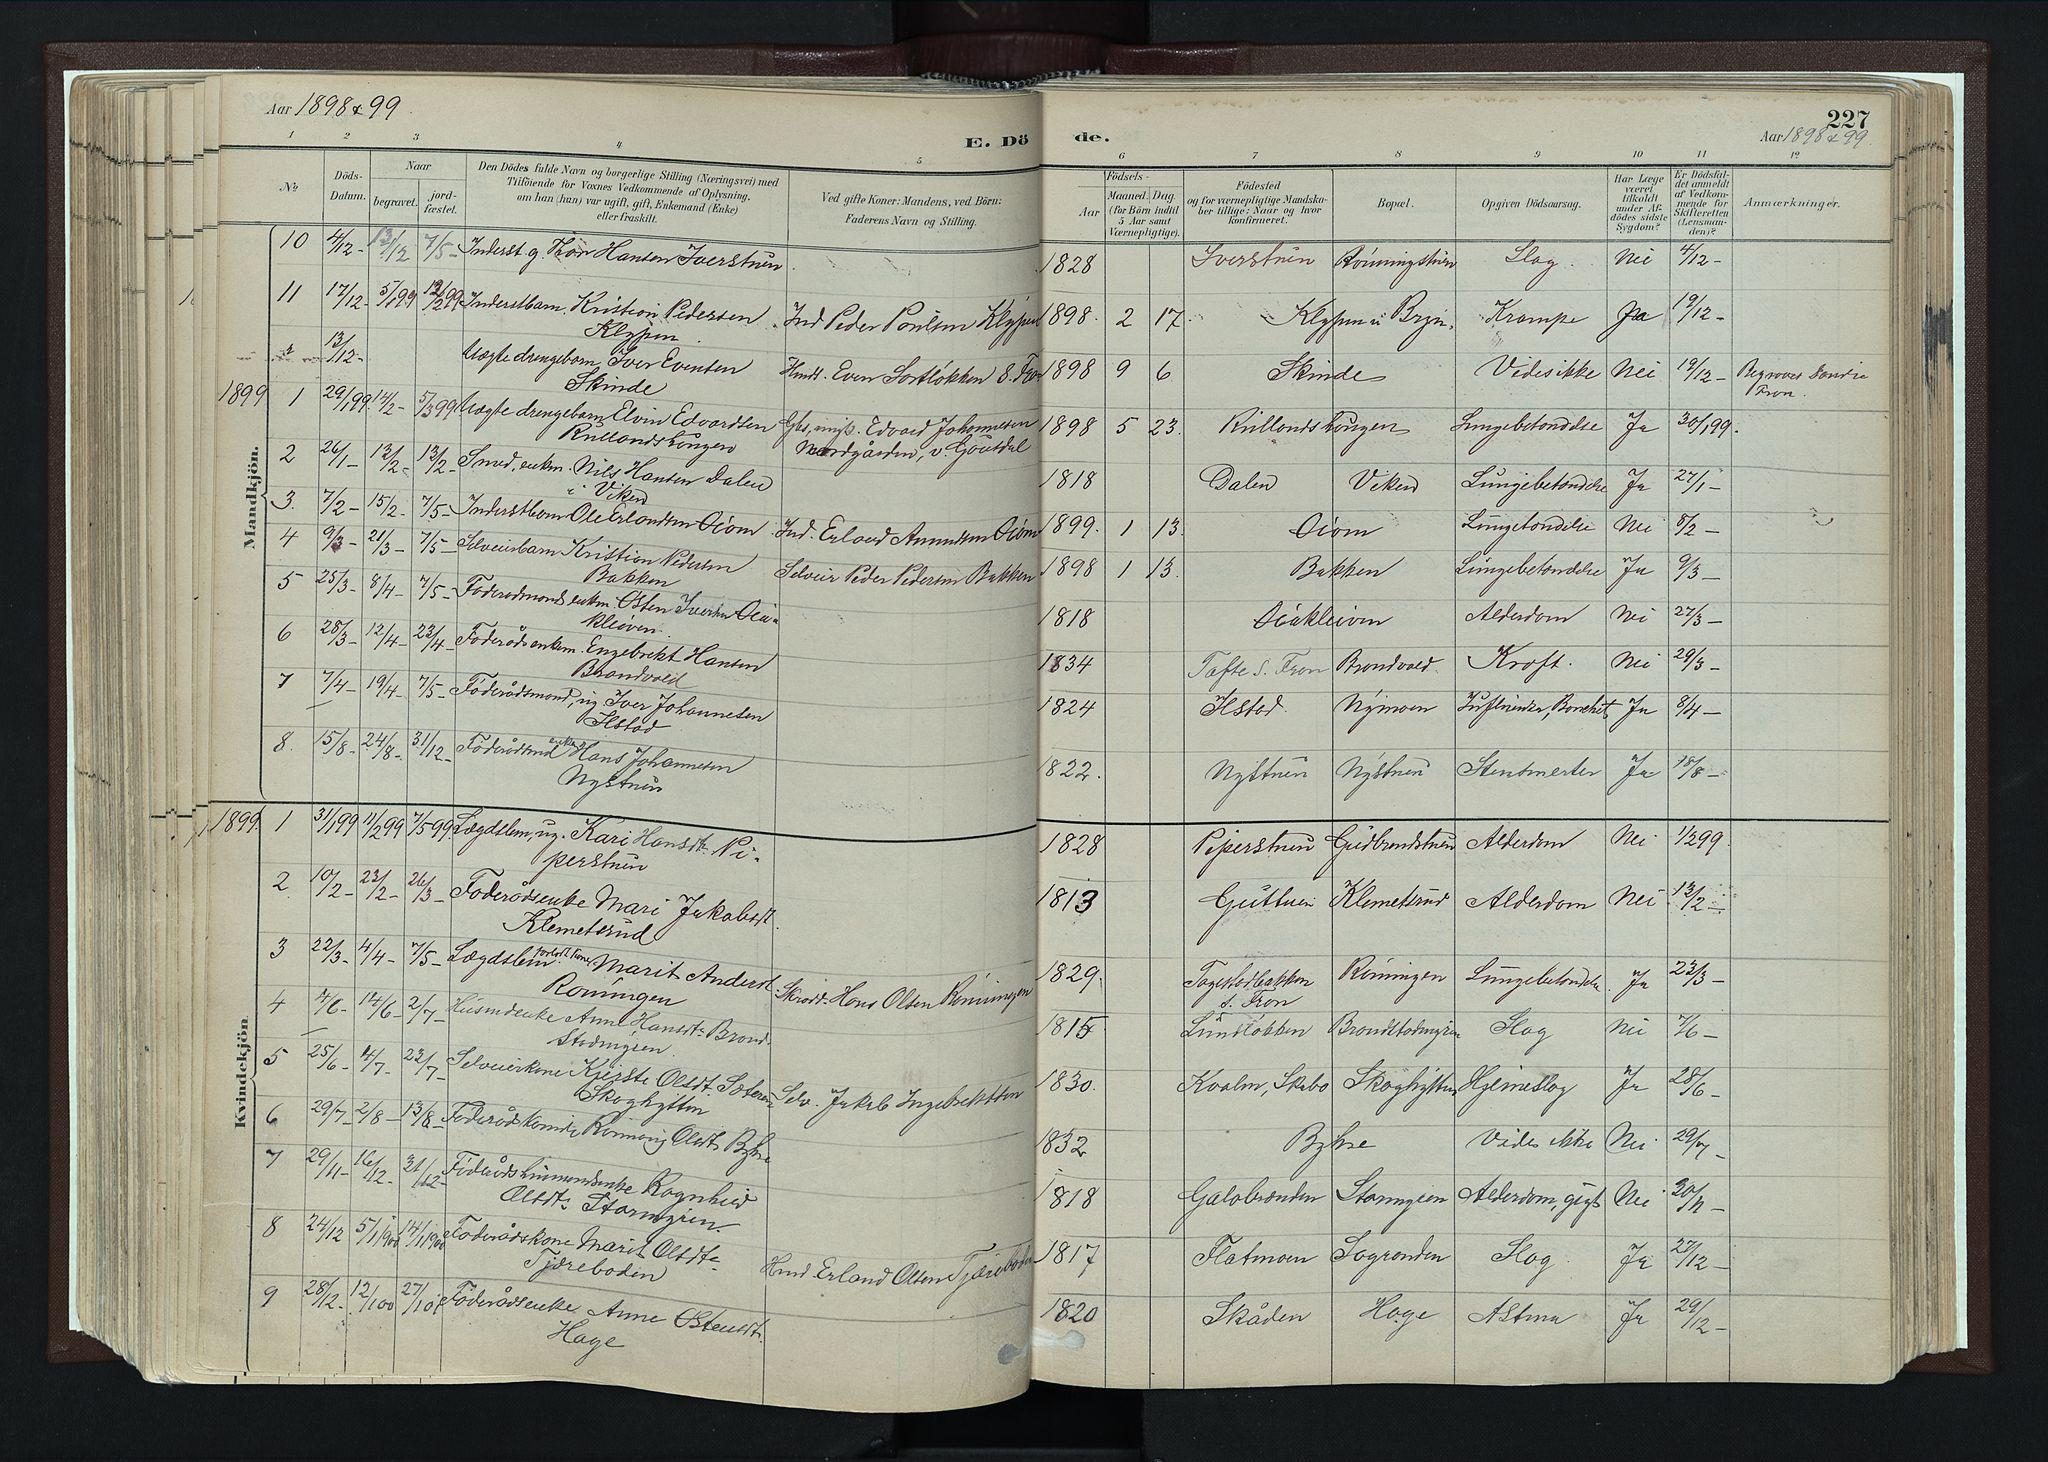 SAH, Nord-Fron prestekontor, Ministerialbok nr. 4, 1884-1914, s. 227